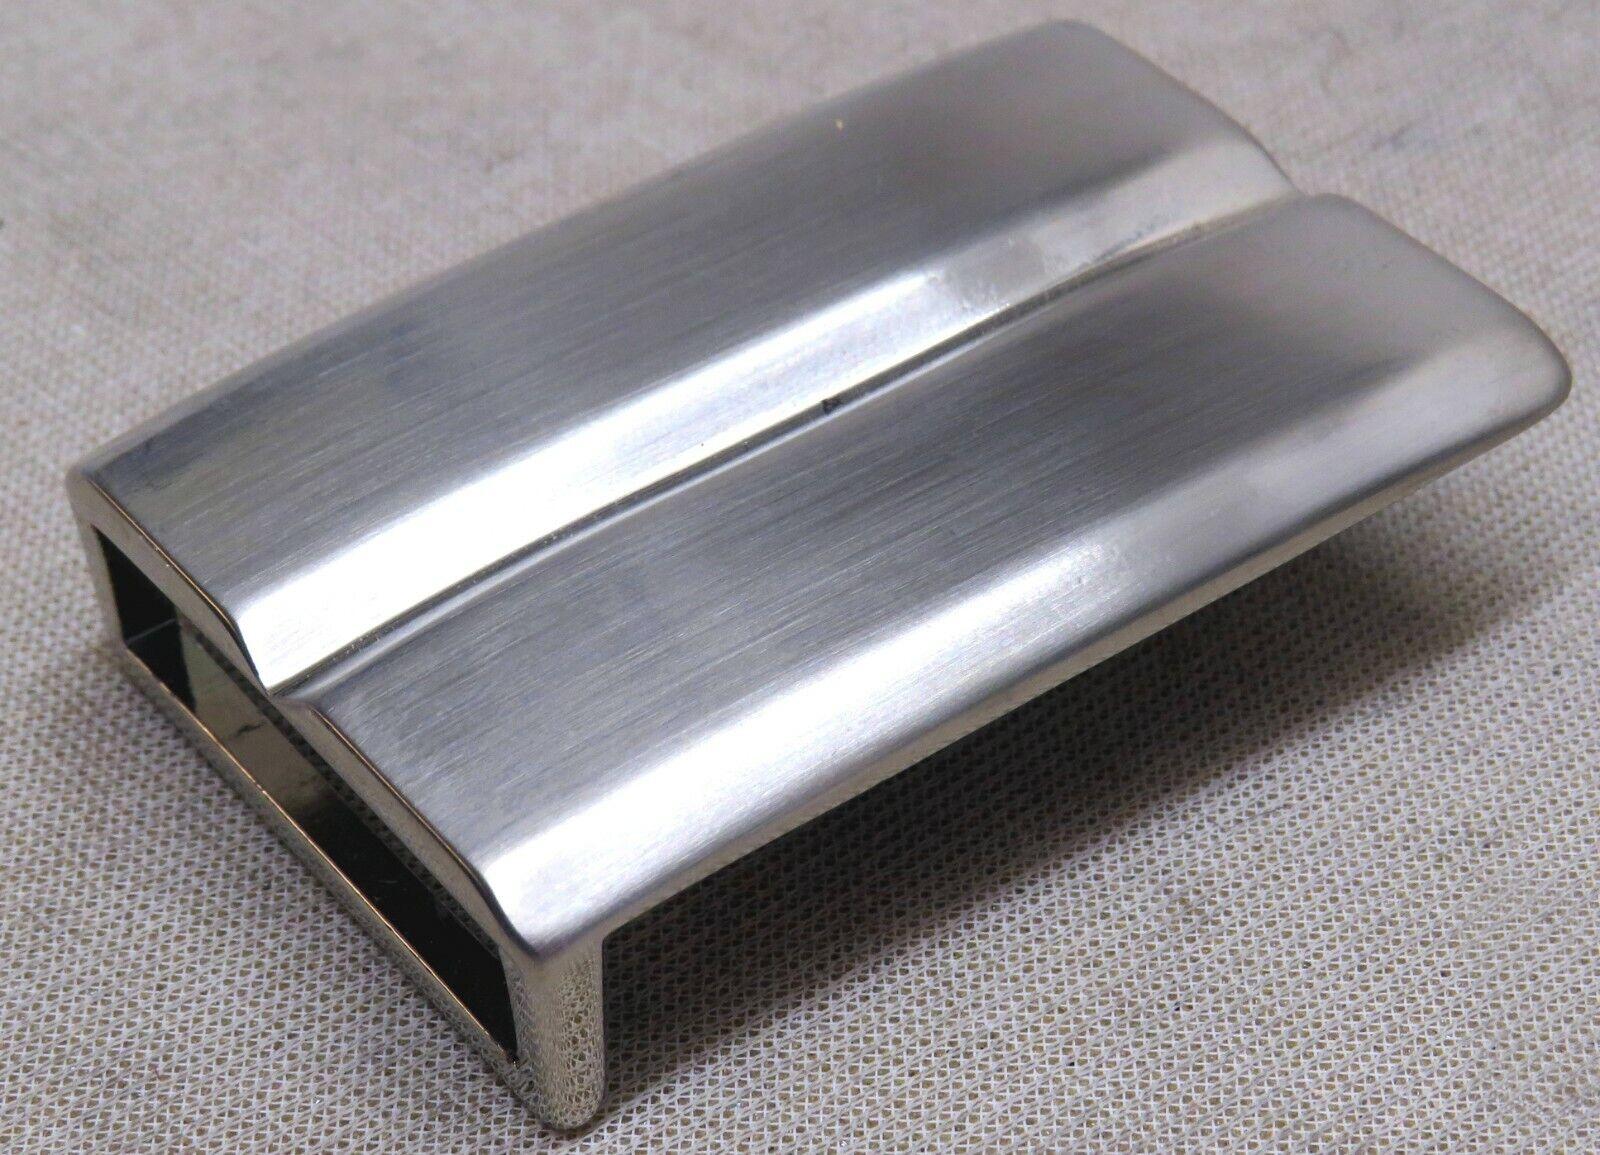 Gürtelschnalle NEU Metall STABIL f. 4cm breite GÜRTEL Farbe: MATTSILBER Elegant#